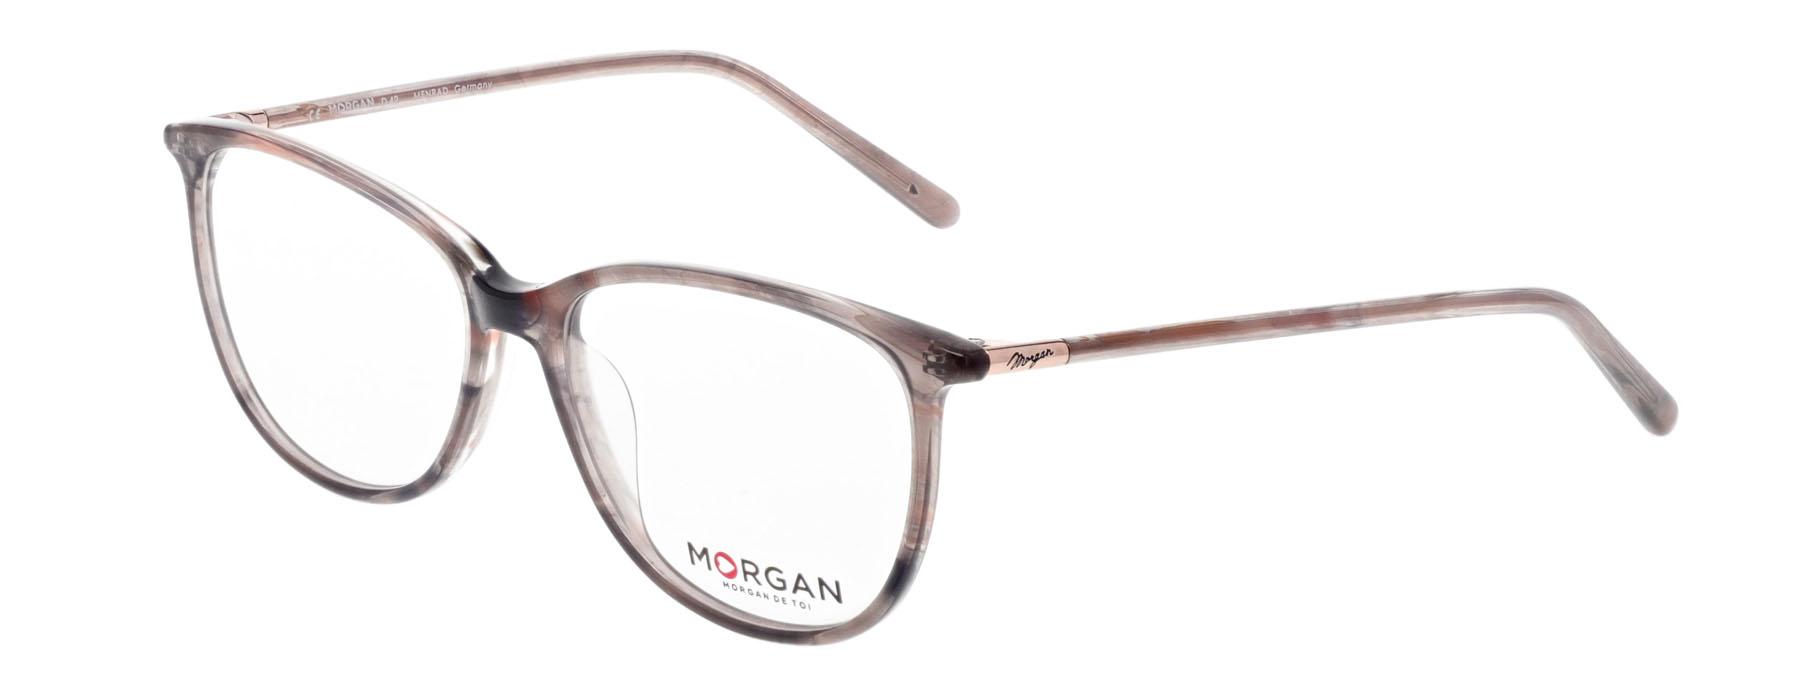 Morgan 202023 4629